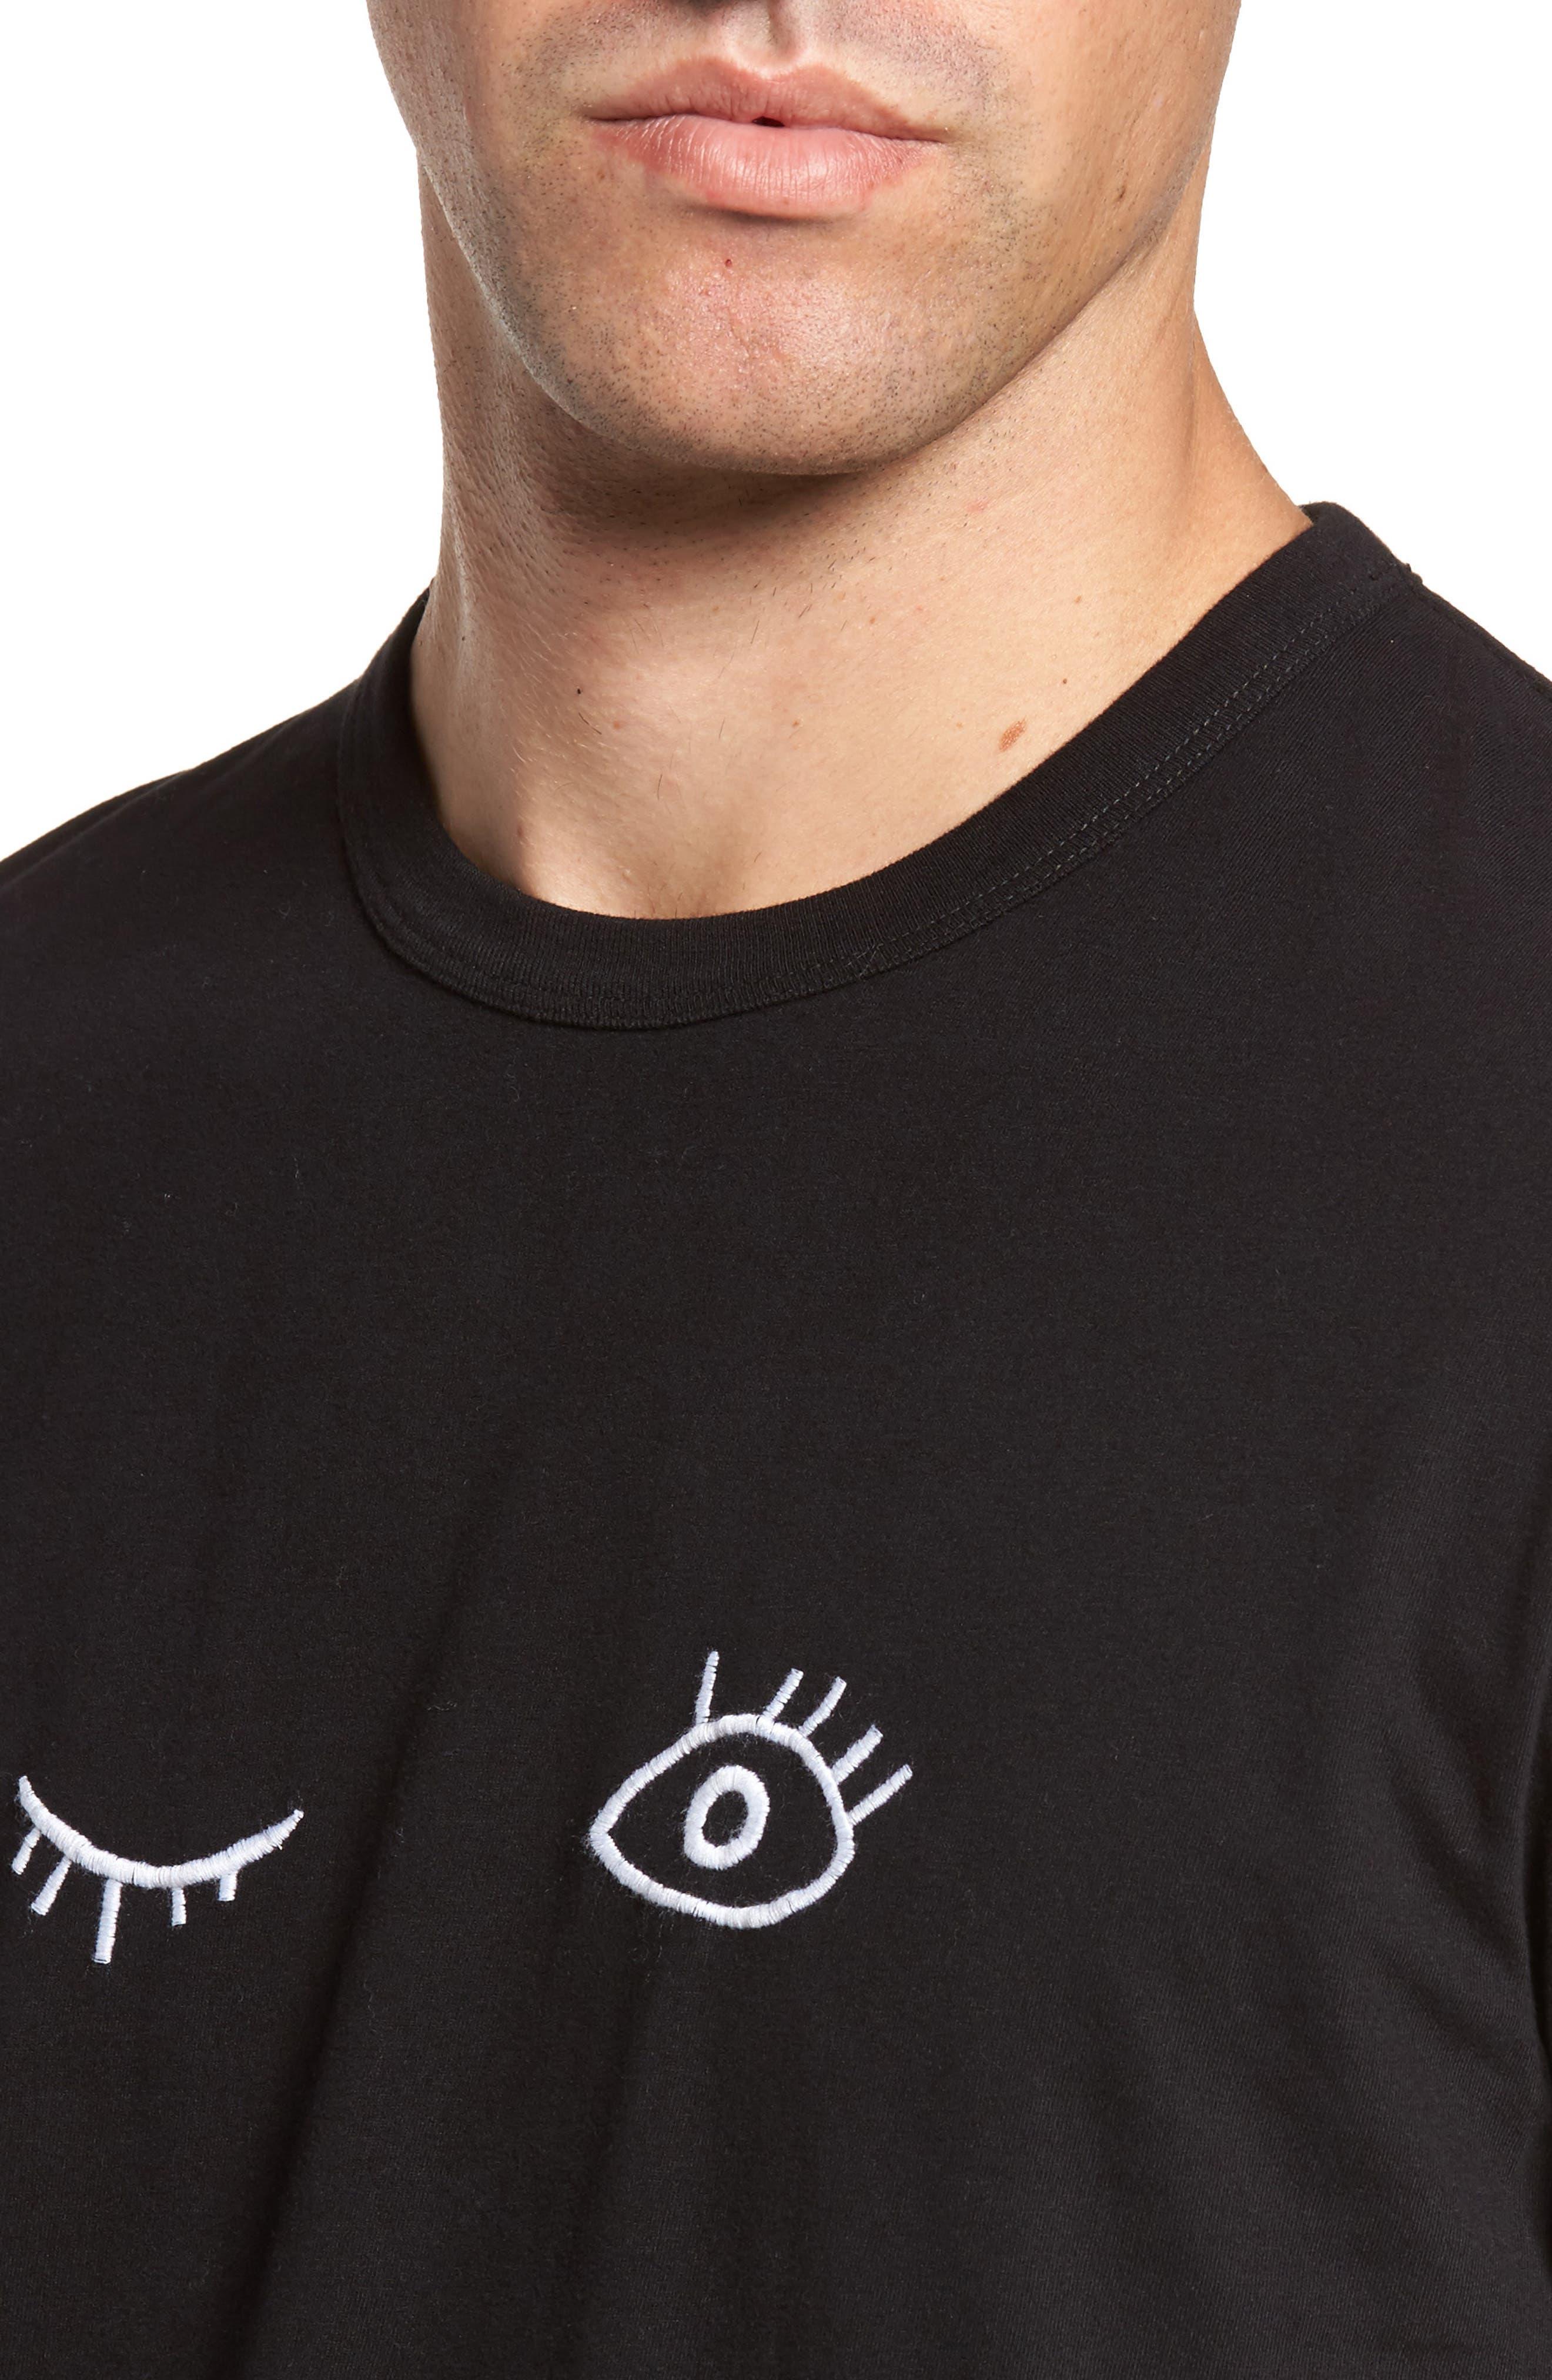 Wink Regular Fit T-Shirt,                             Alternate thumbnail 4, color,                             104